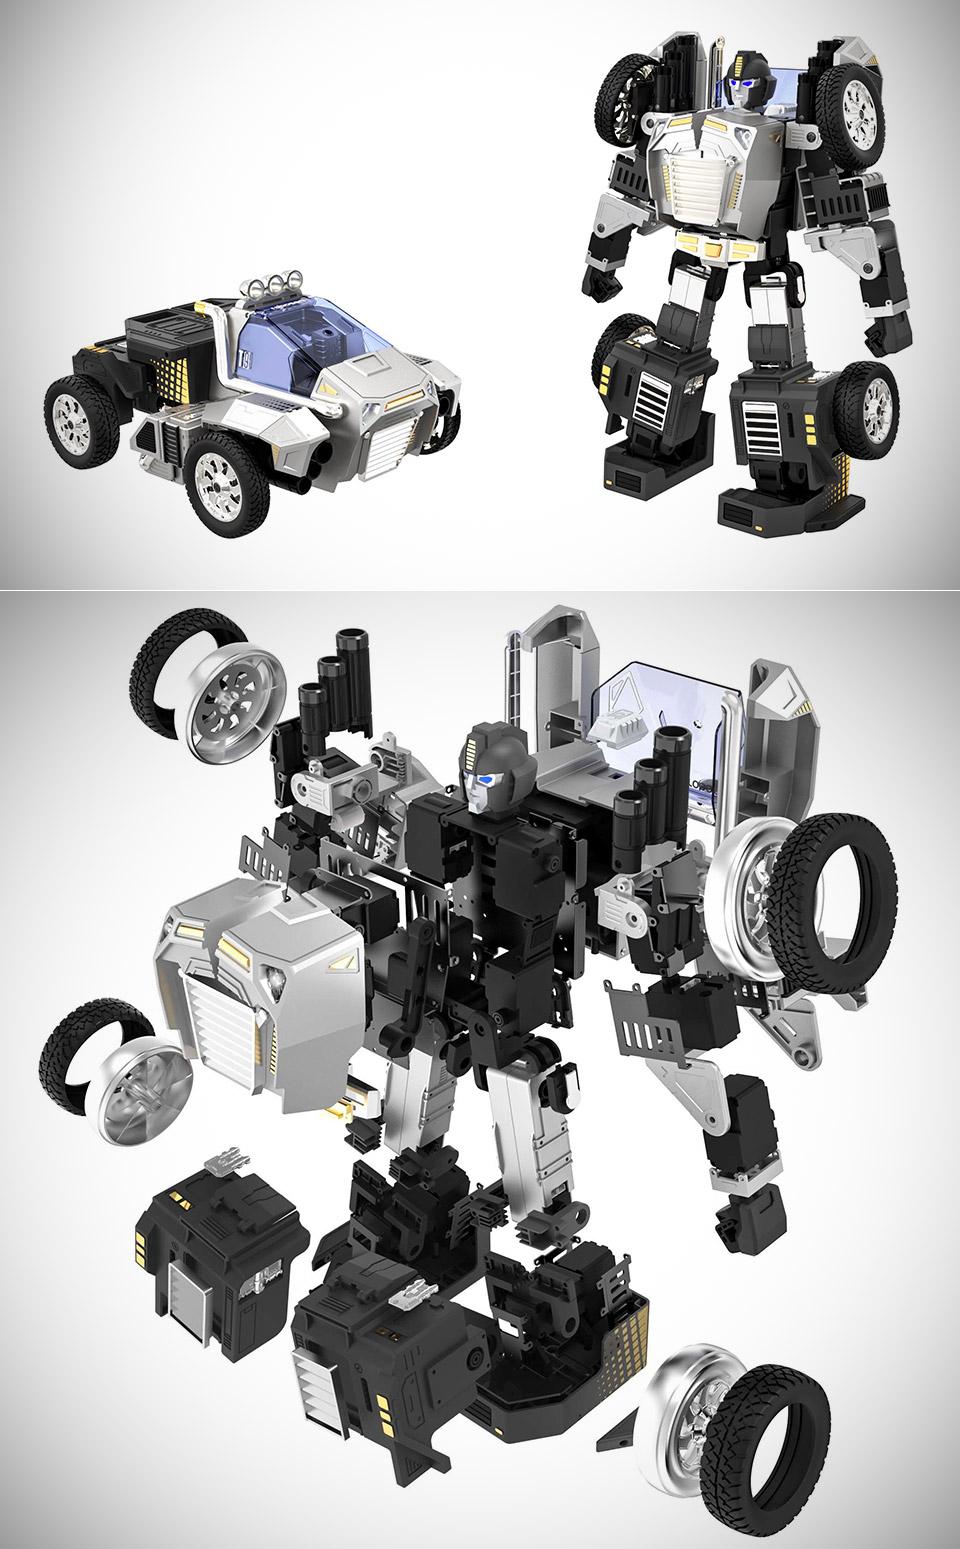 Robosen T9 Transformers Toy